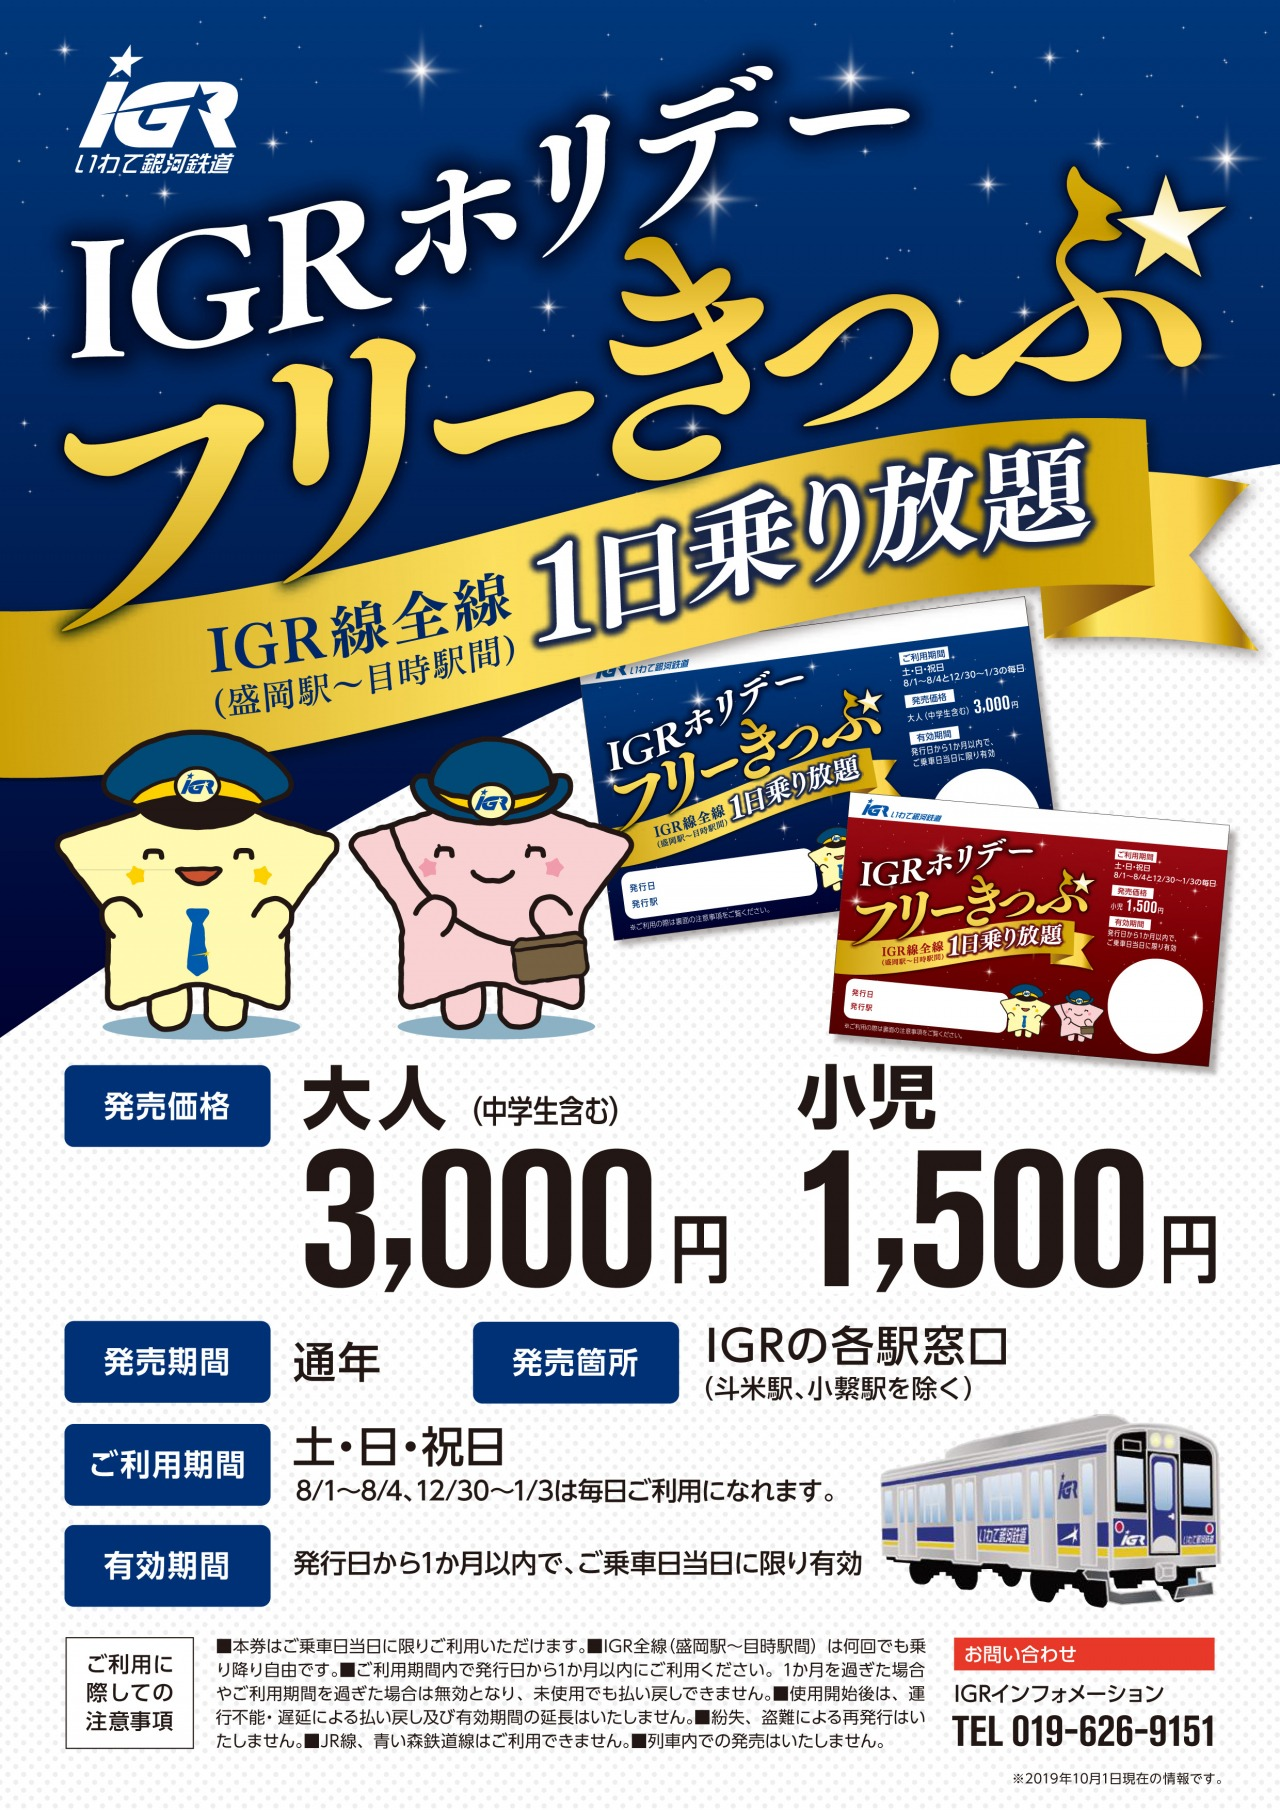 IGR Holiday Unlimited Ride Ticket